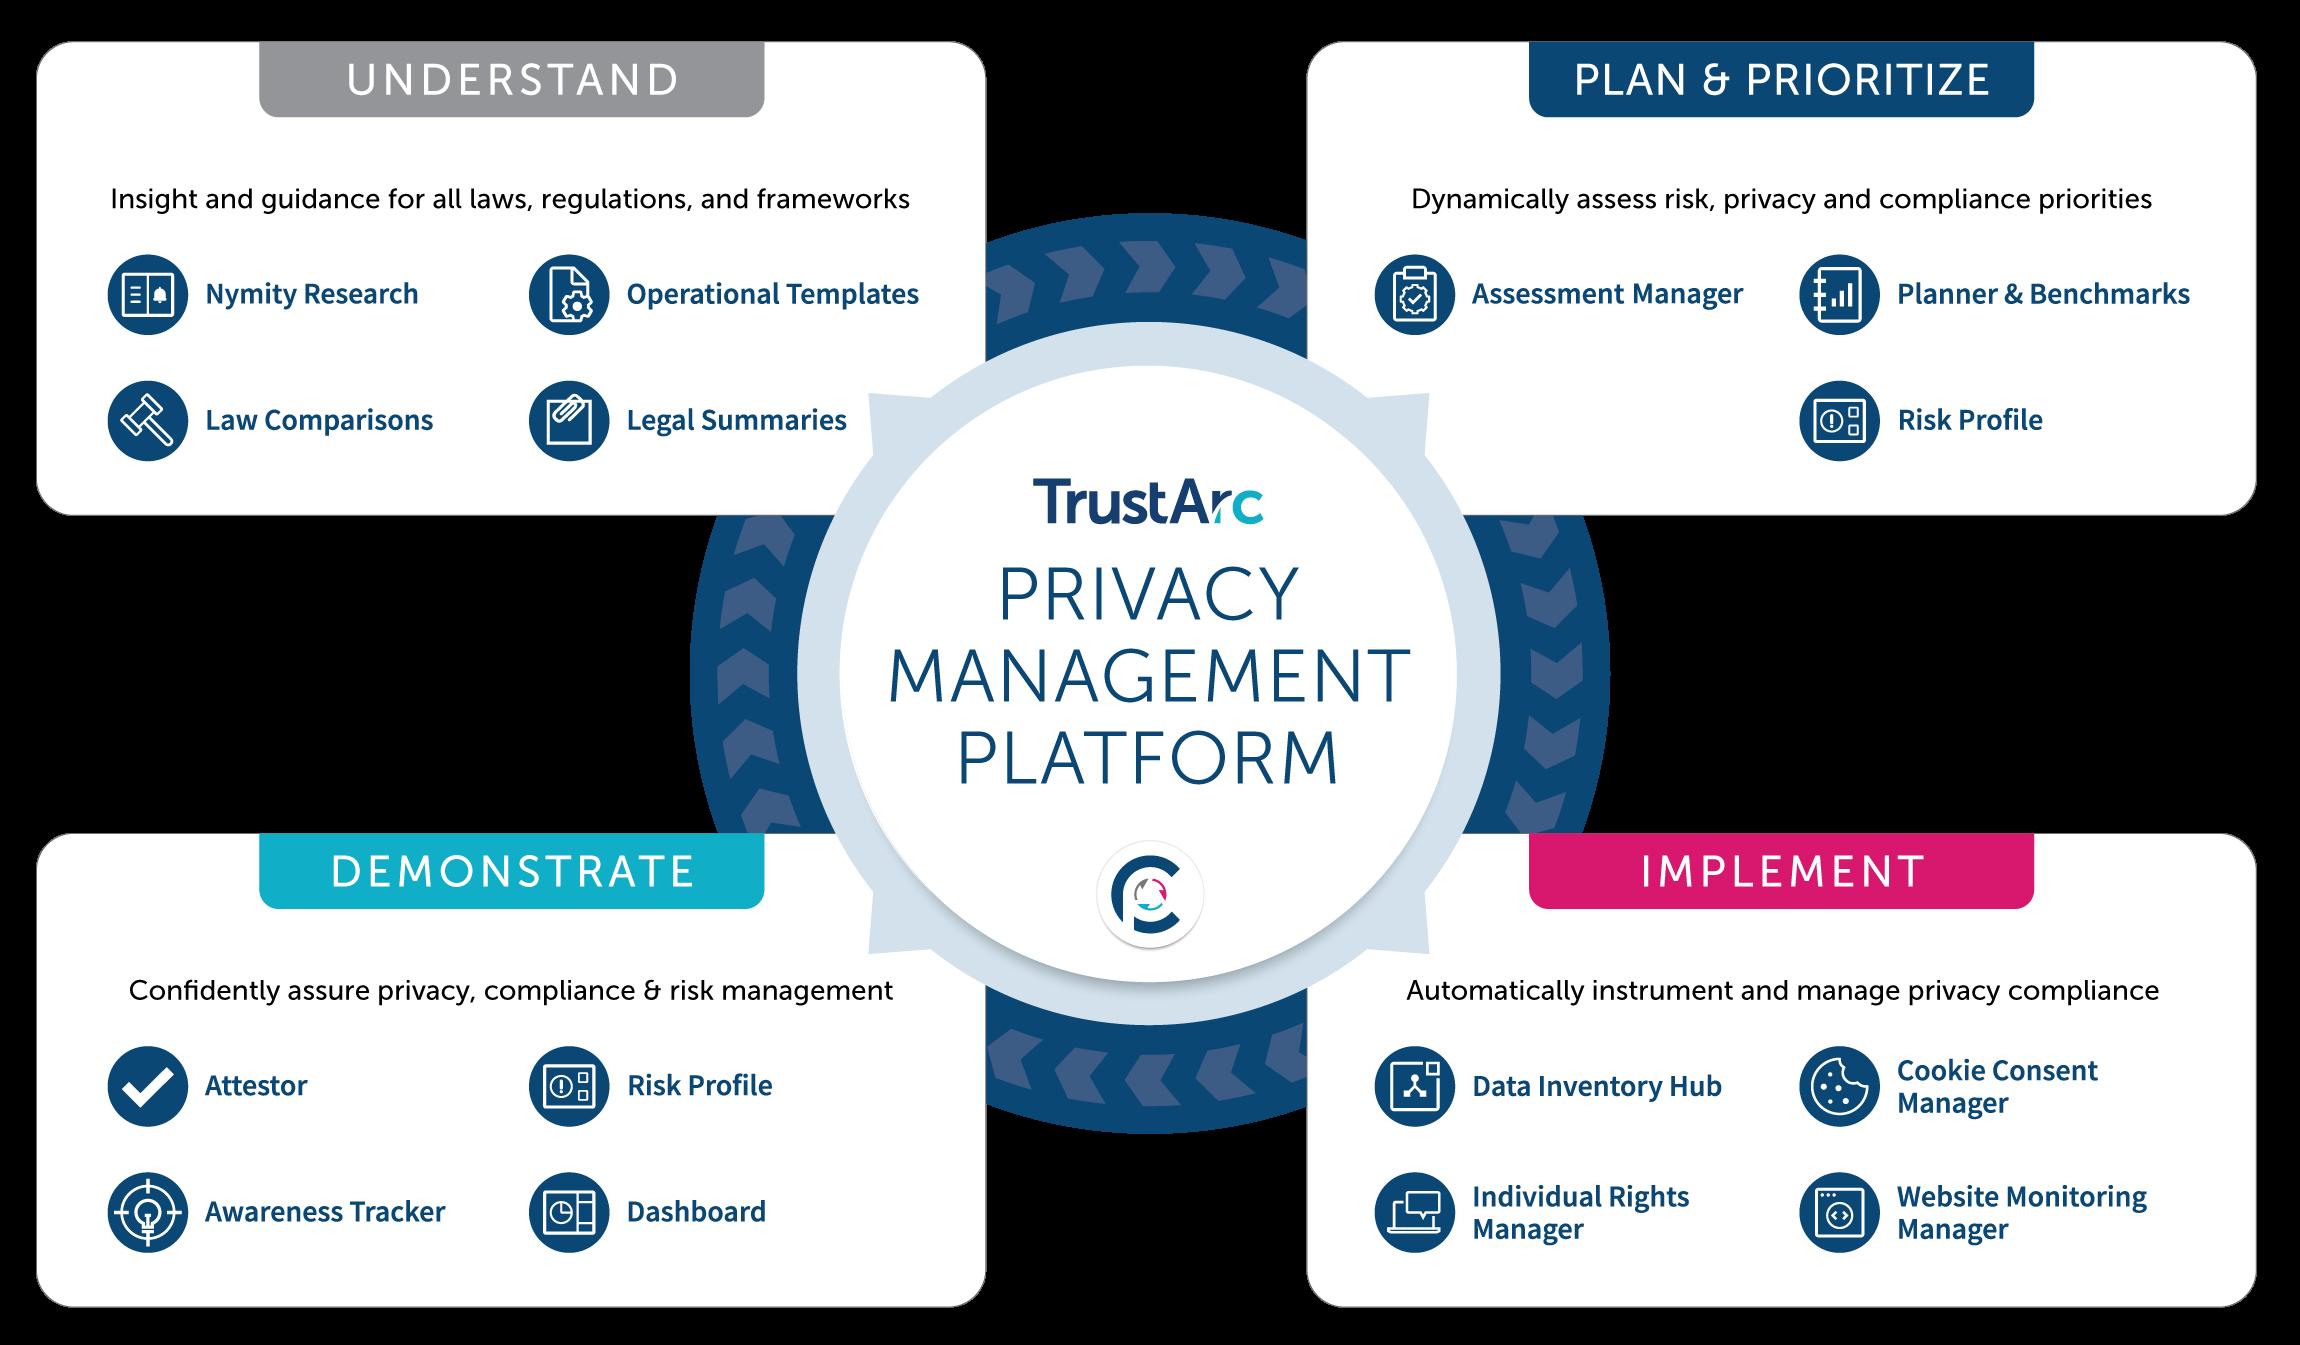 TrustArc PrivacyCentral